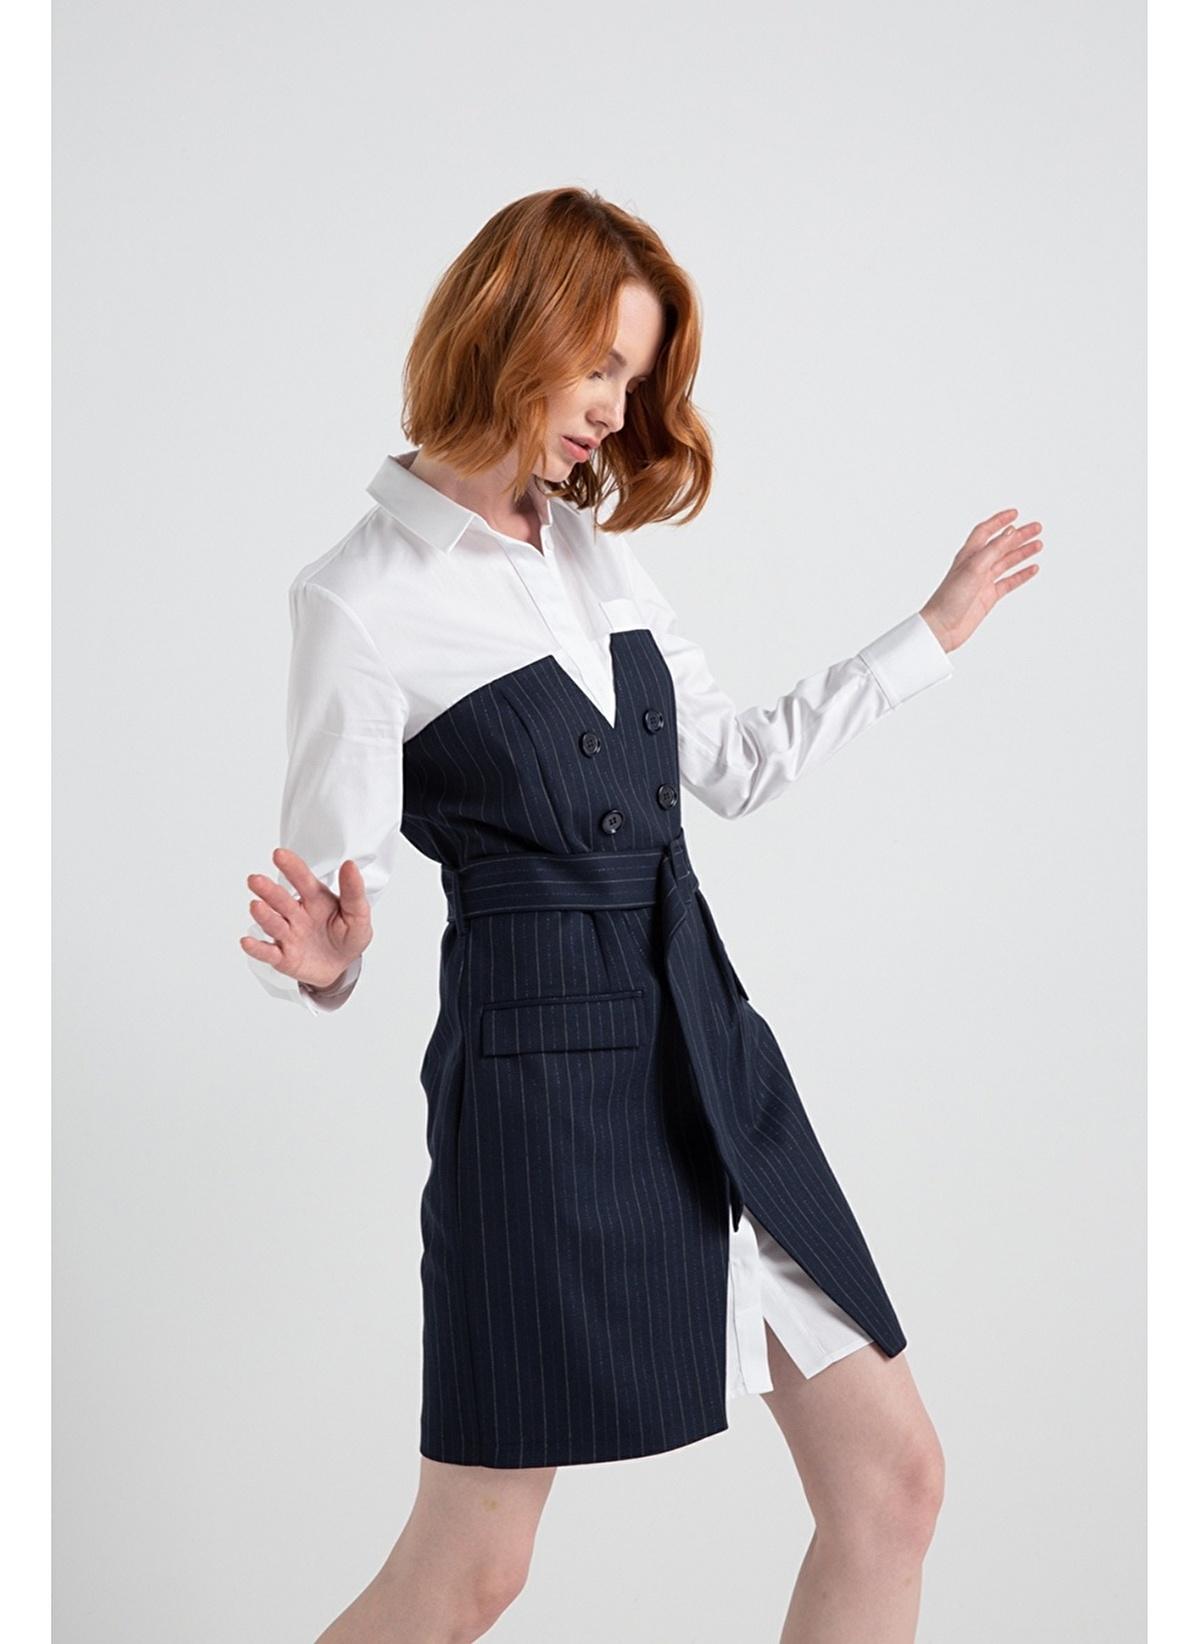 Rue Çift Görünümlü Çizgili Gömlek Elbise 689.0 Tl